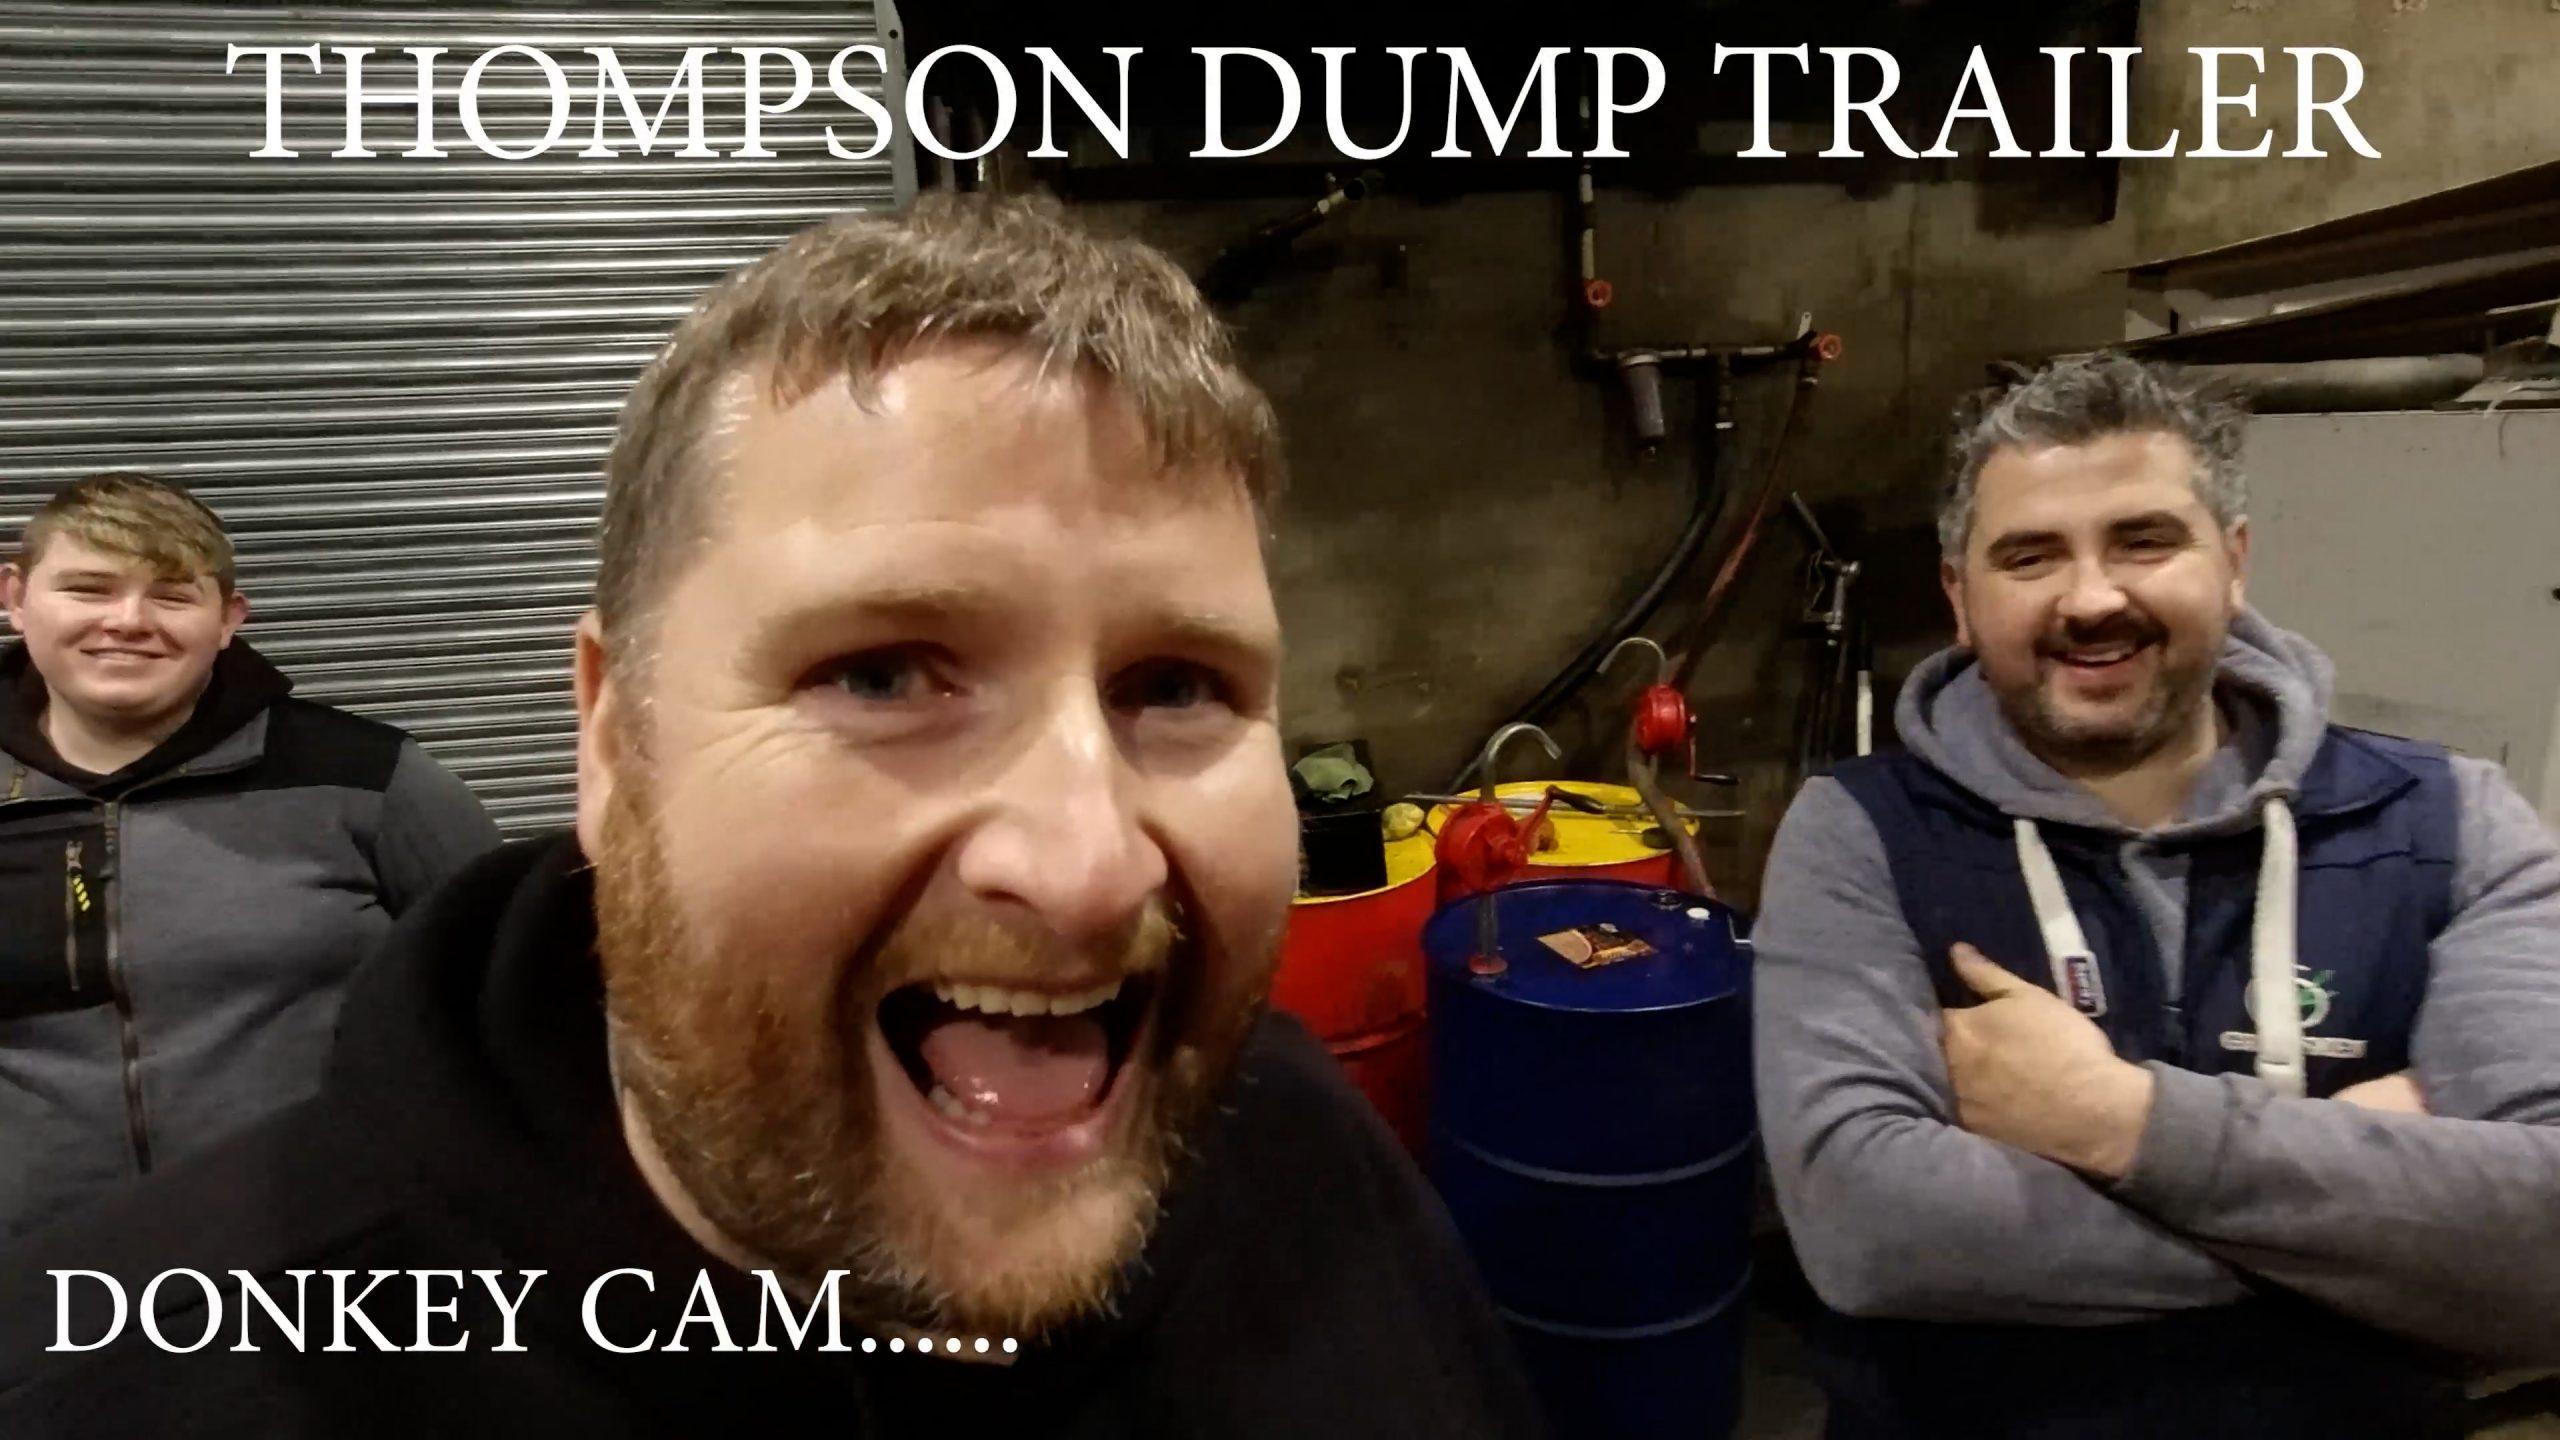 Thompson Dump Trailer review